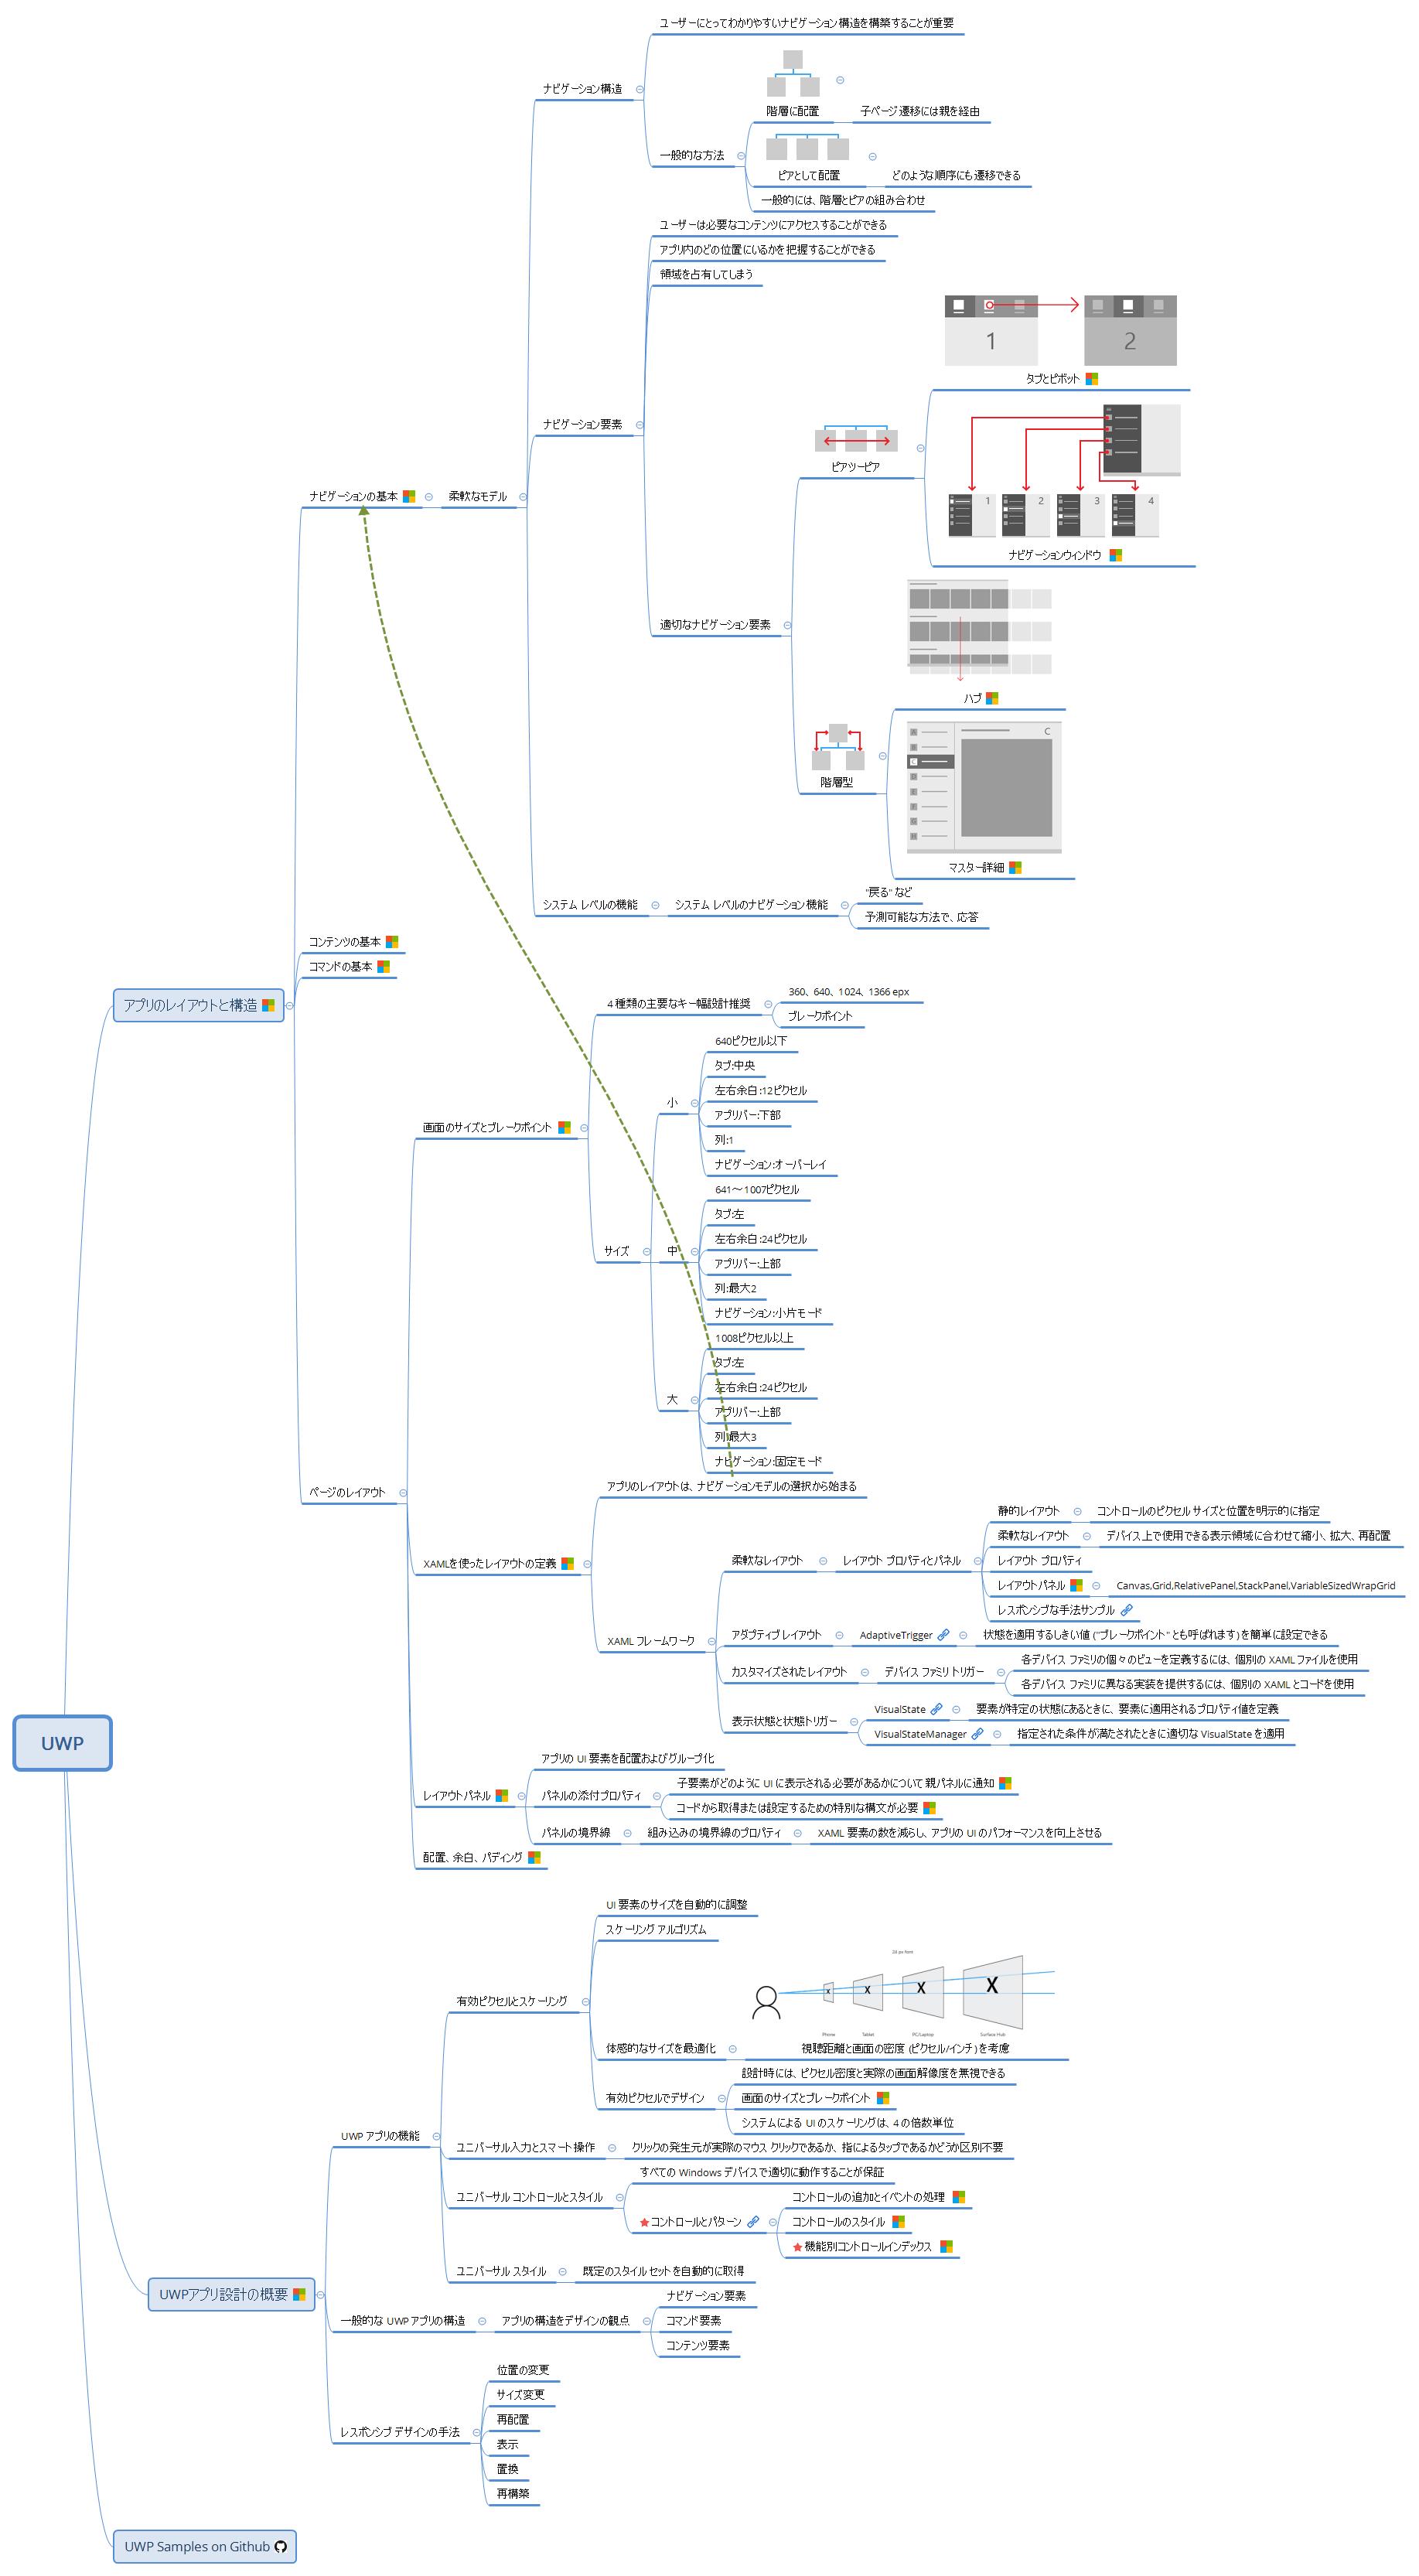 UWPアプリ設計のまとめ、リンク